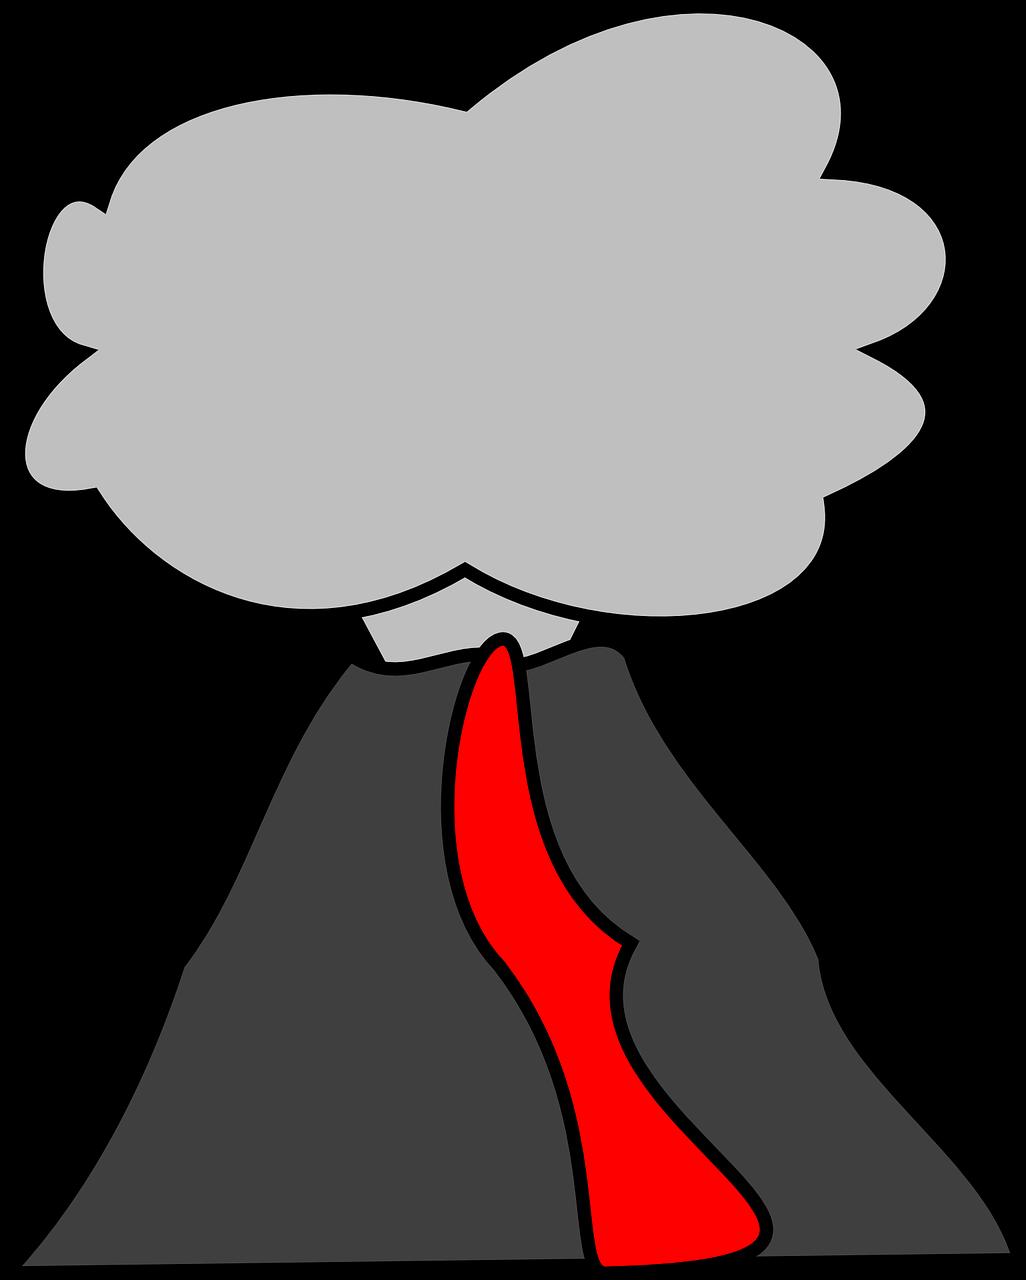 Volcano Nature Clip Art Gambar Gunung Meletus Animasi